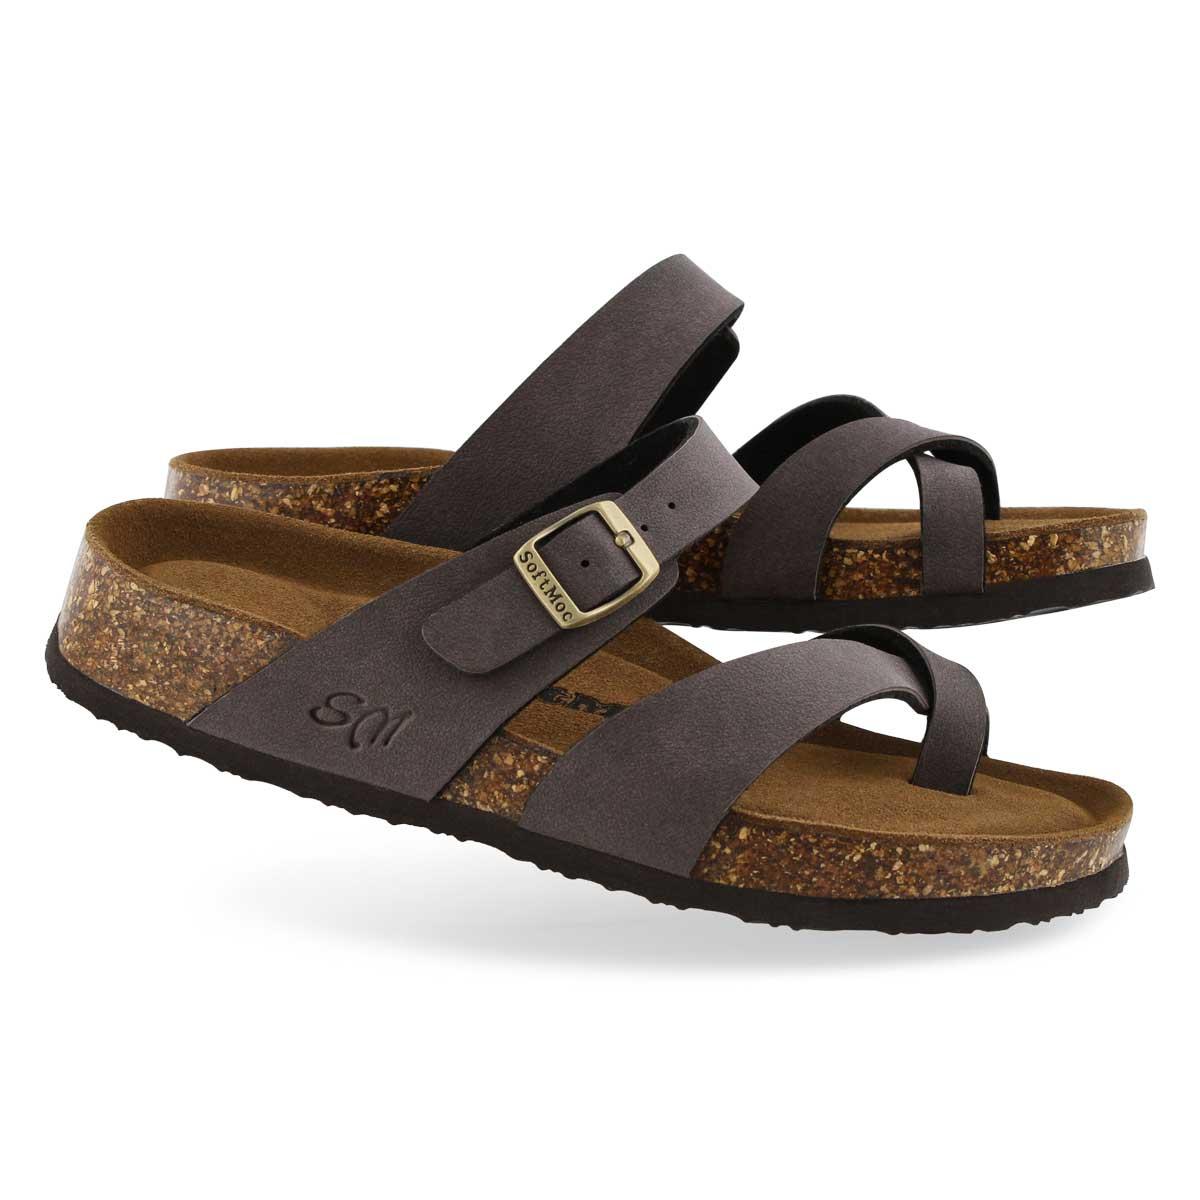 Lds Alicia 5 PU mocha memory foam sandal